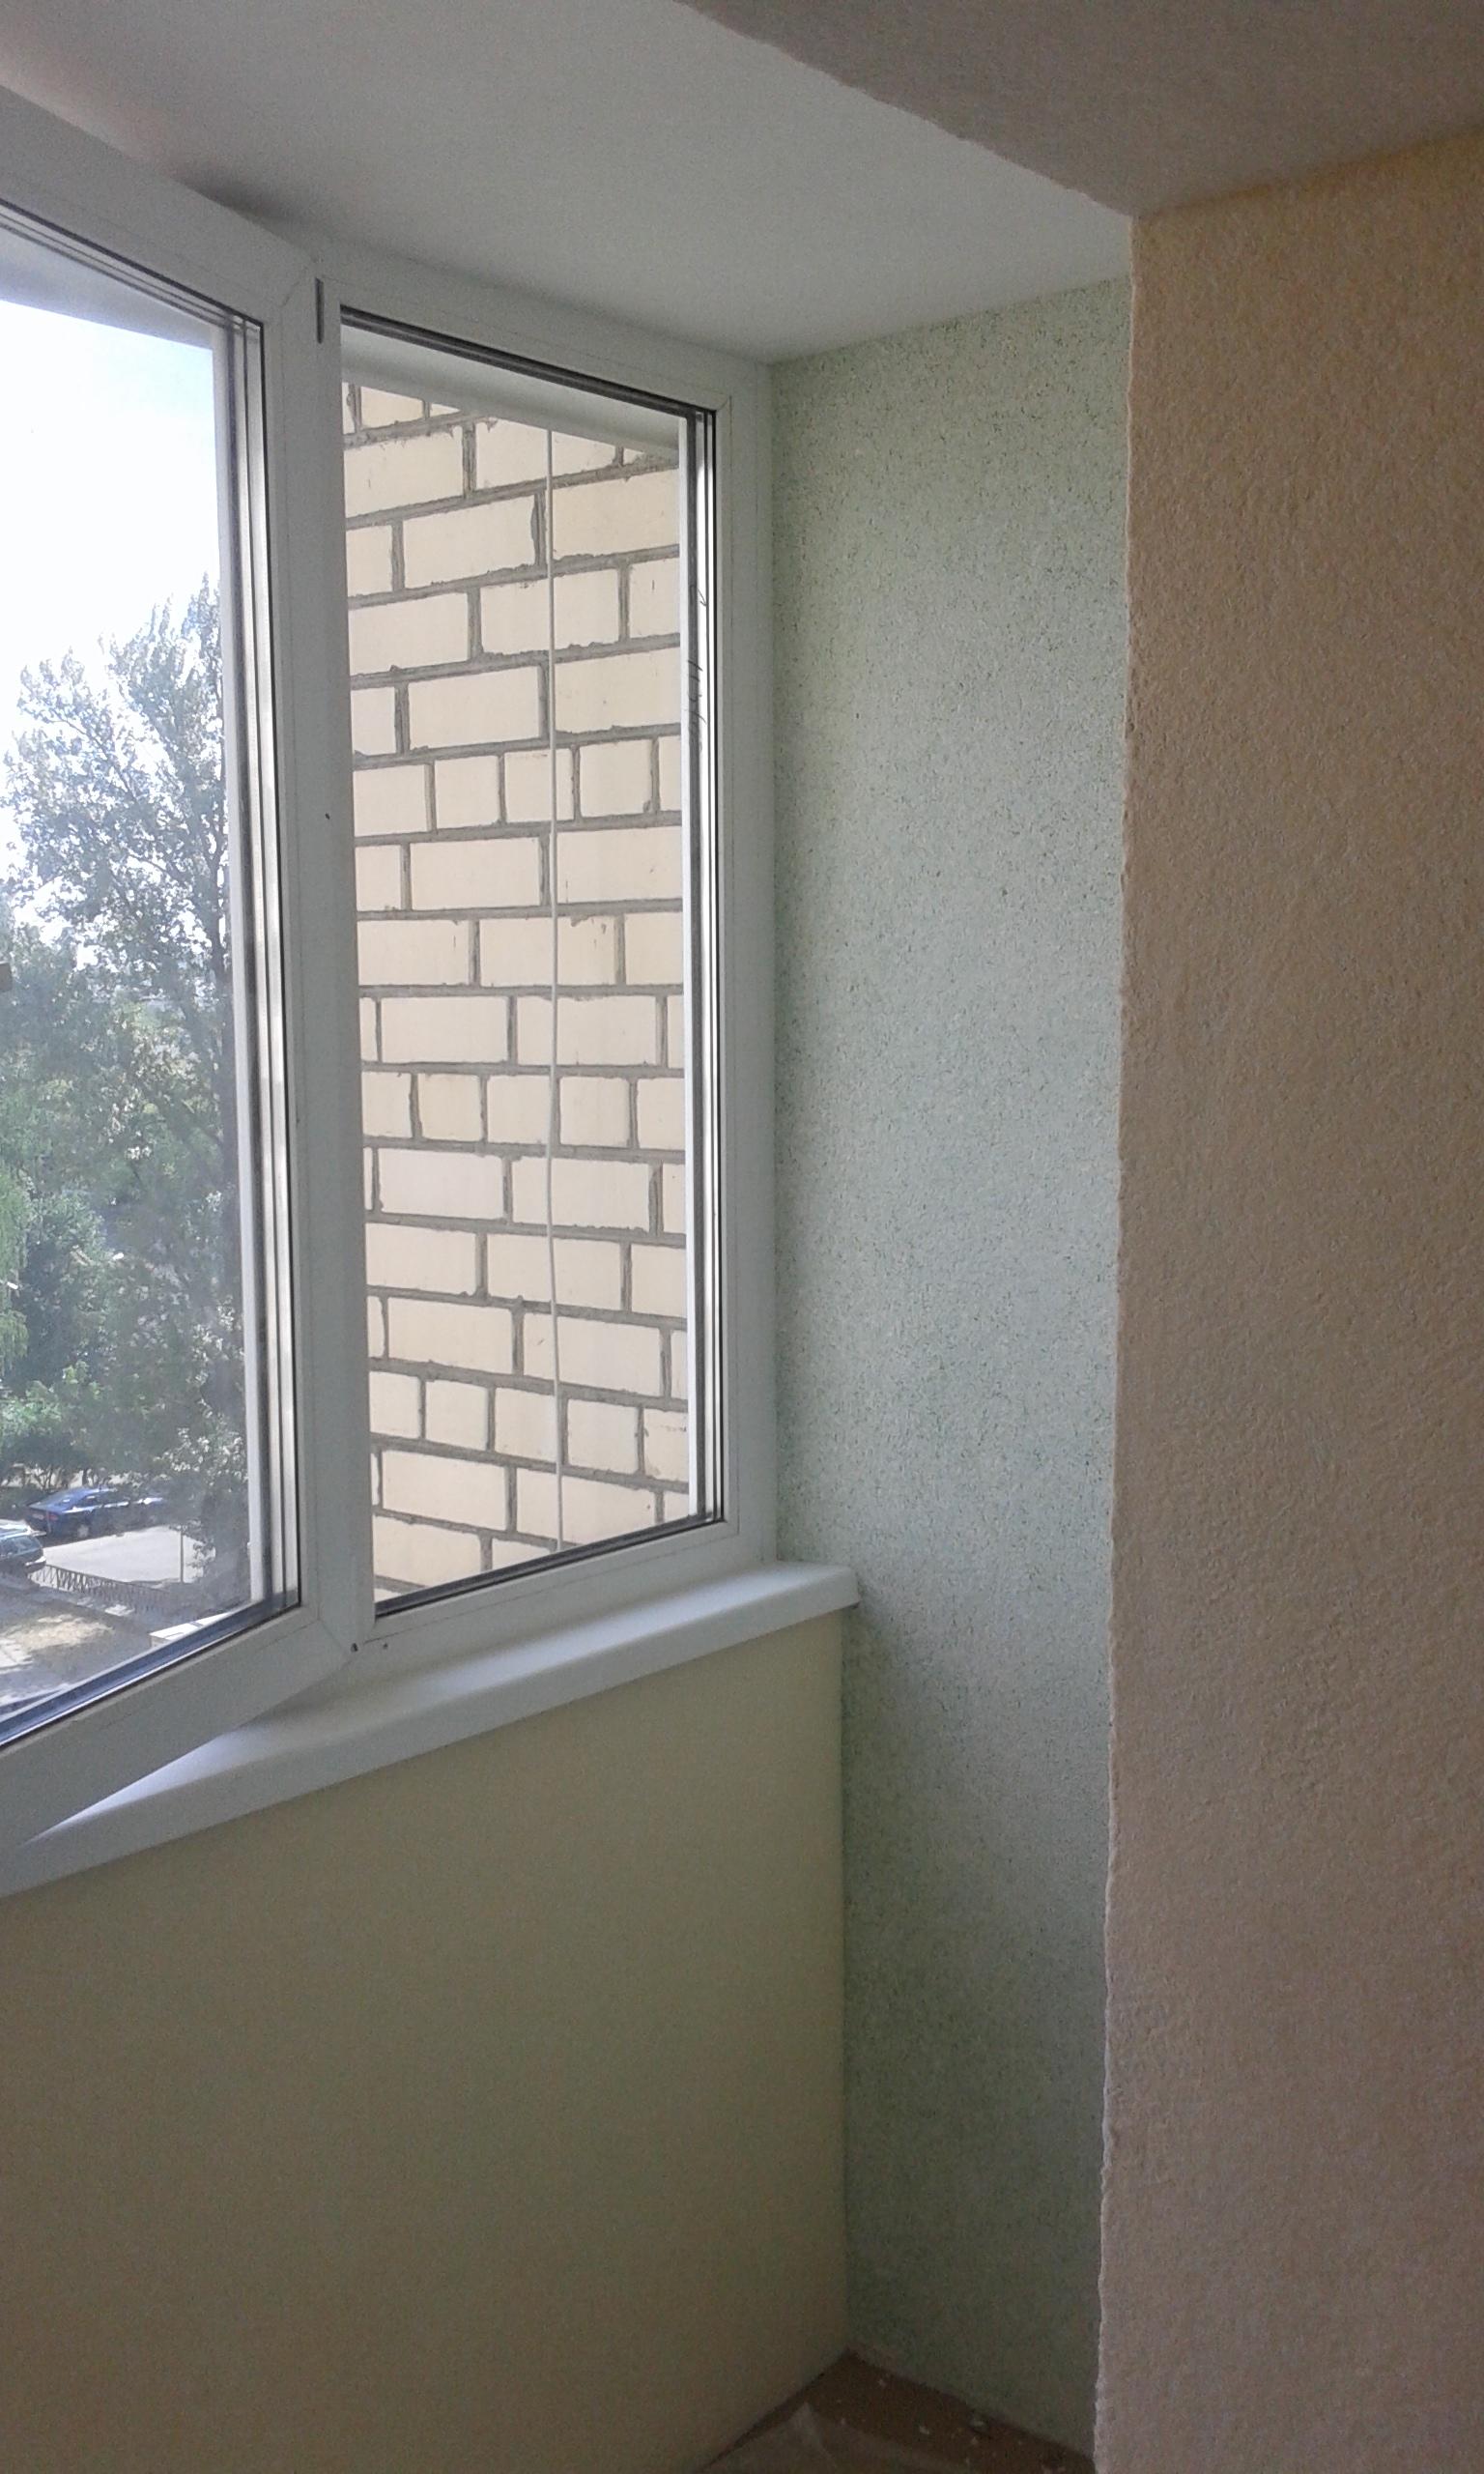 "Ремонт балконов, лоджий ""под ключ"" в минске, отделка балкона."